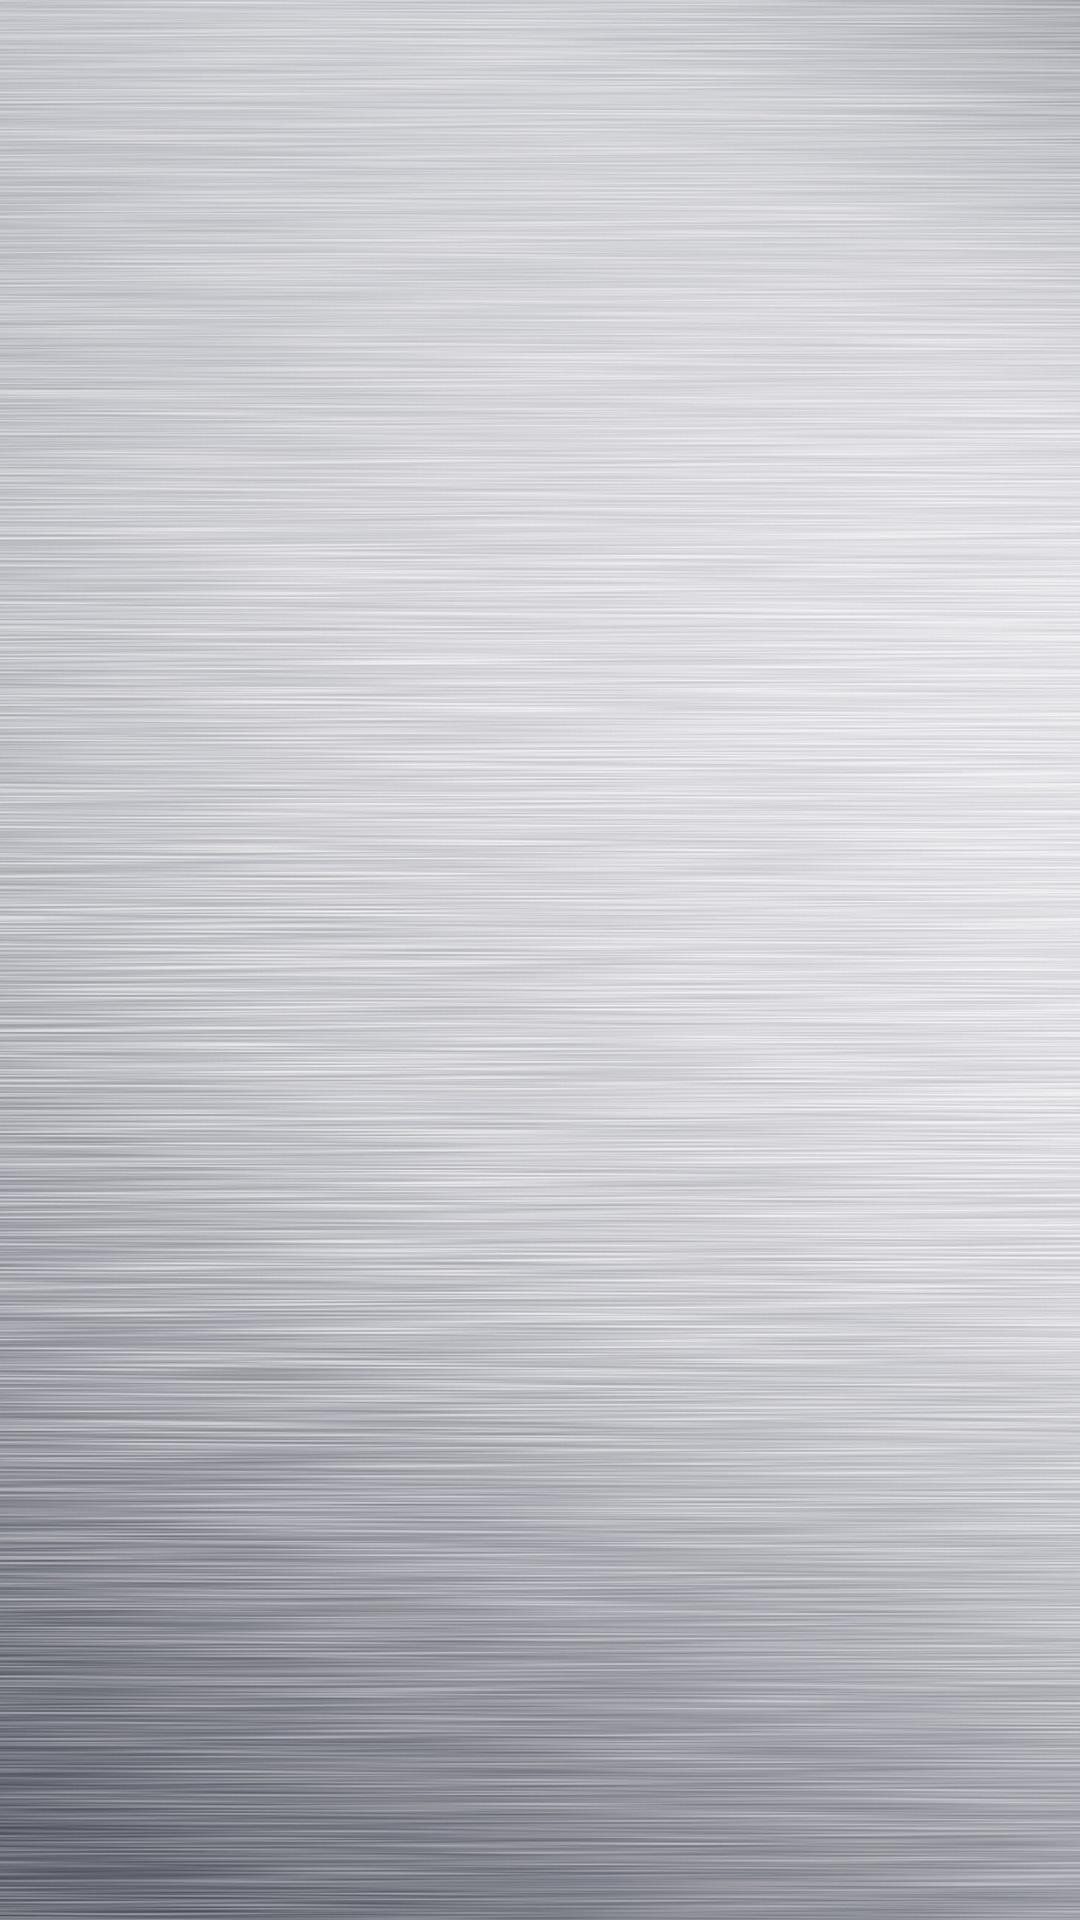 Metallic Silver Iphone Hd Wallpaper Iphone Wallpaper